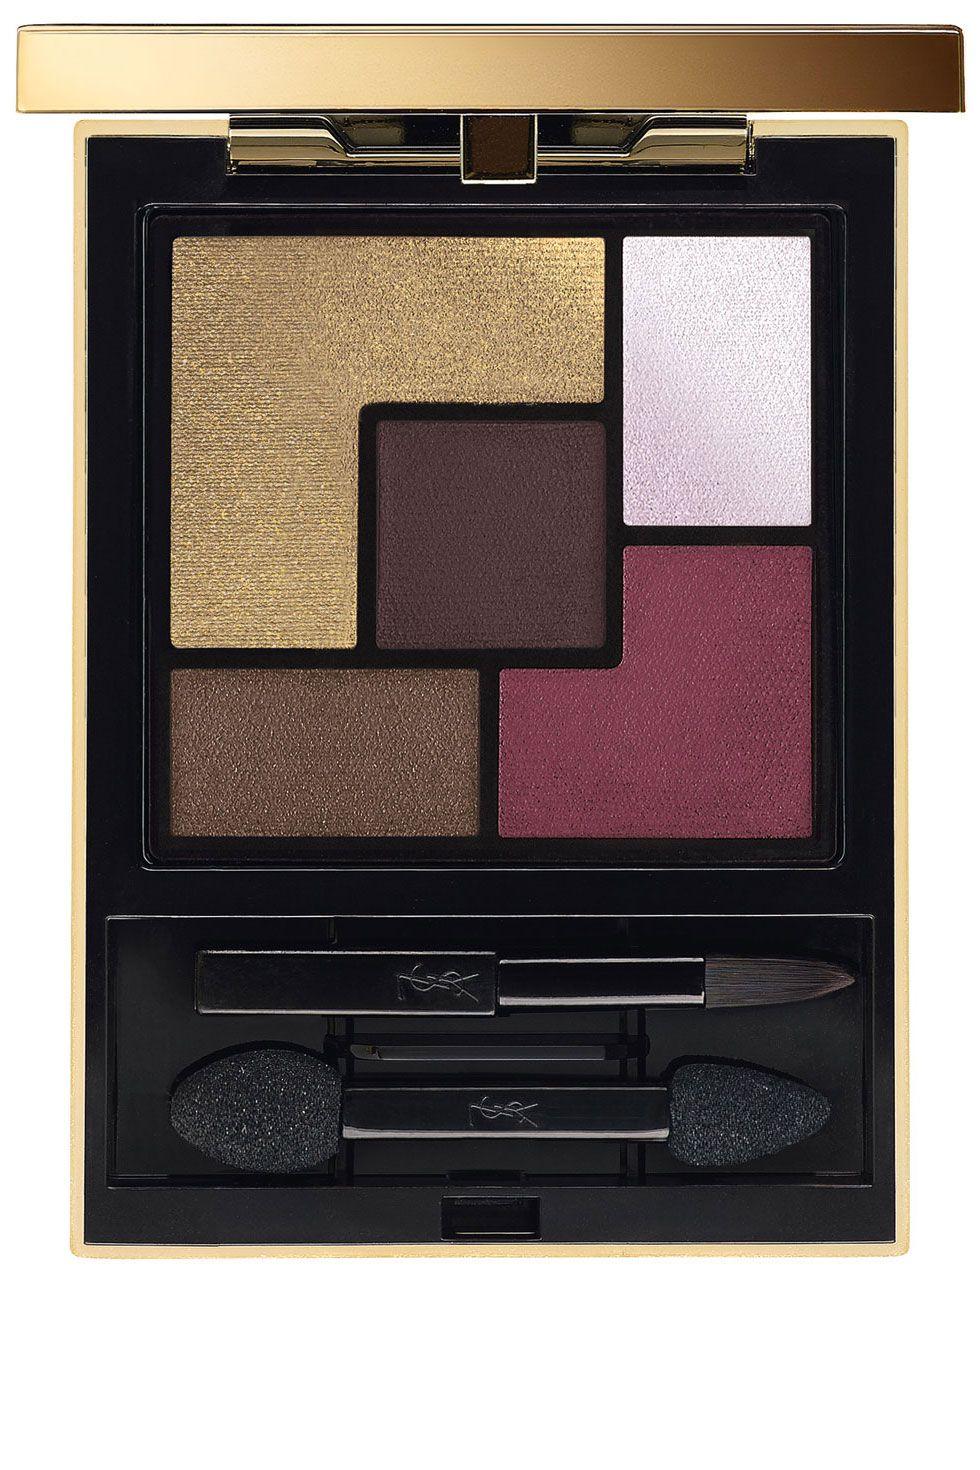 10 New Metallic Eyeshadow Palettes - Best Metallic Eyeshadows